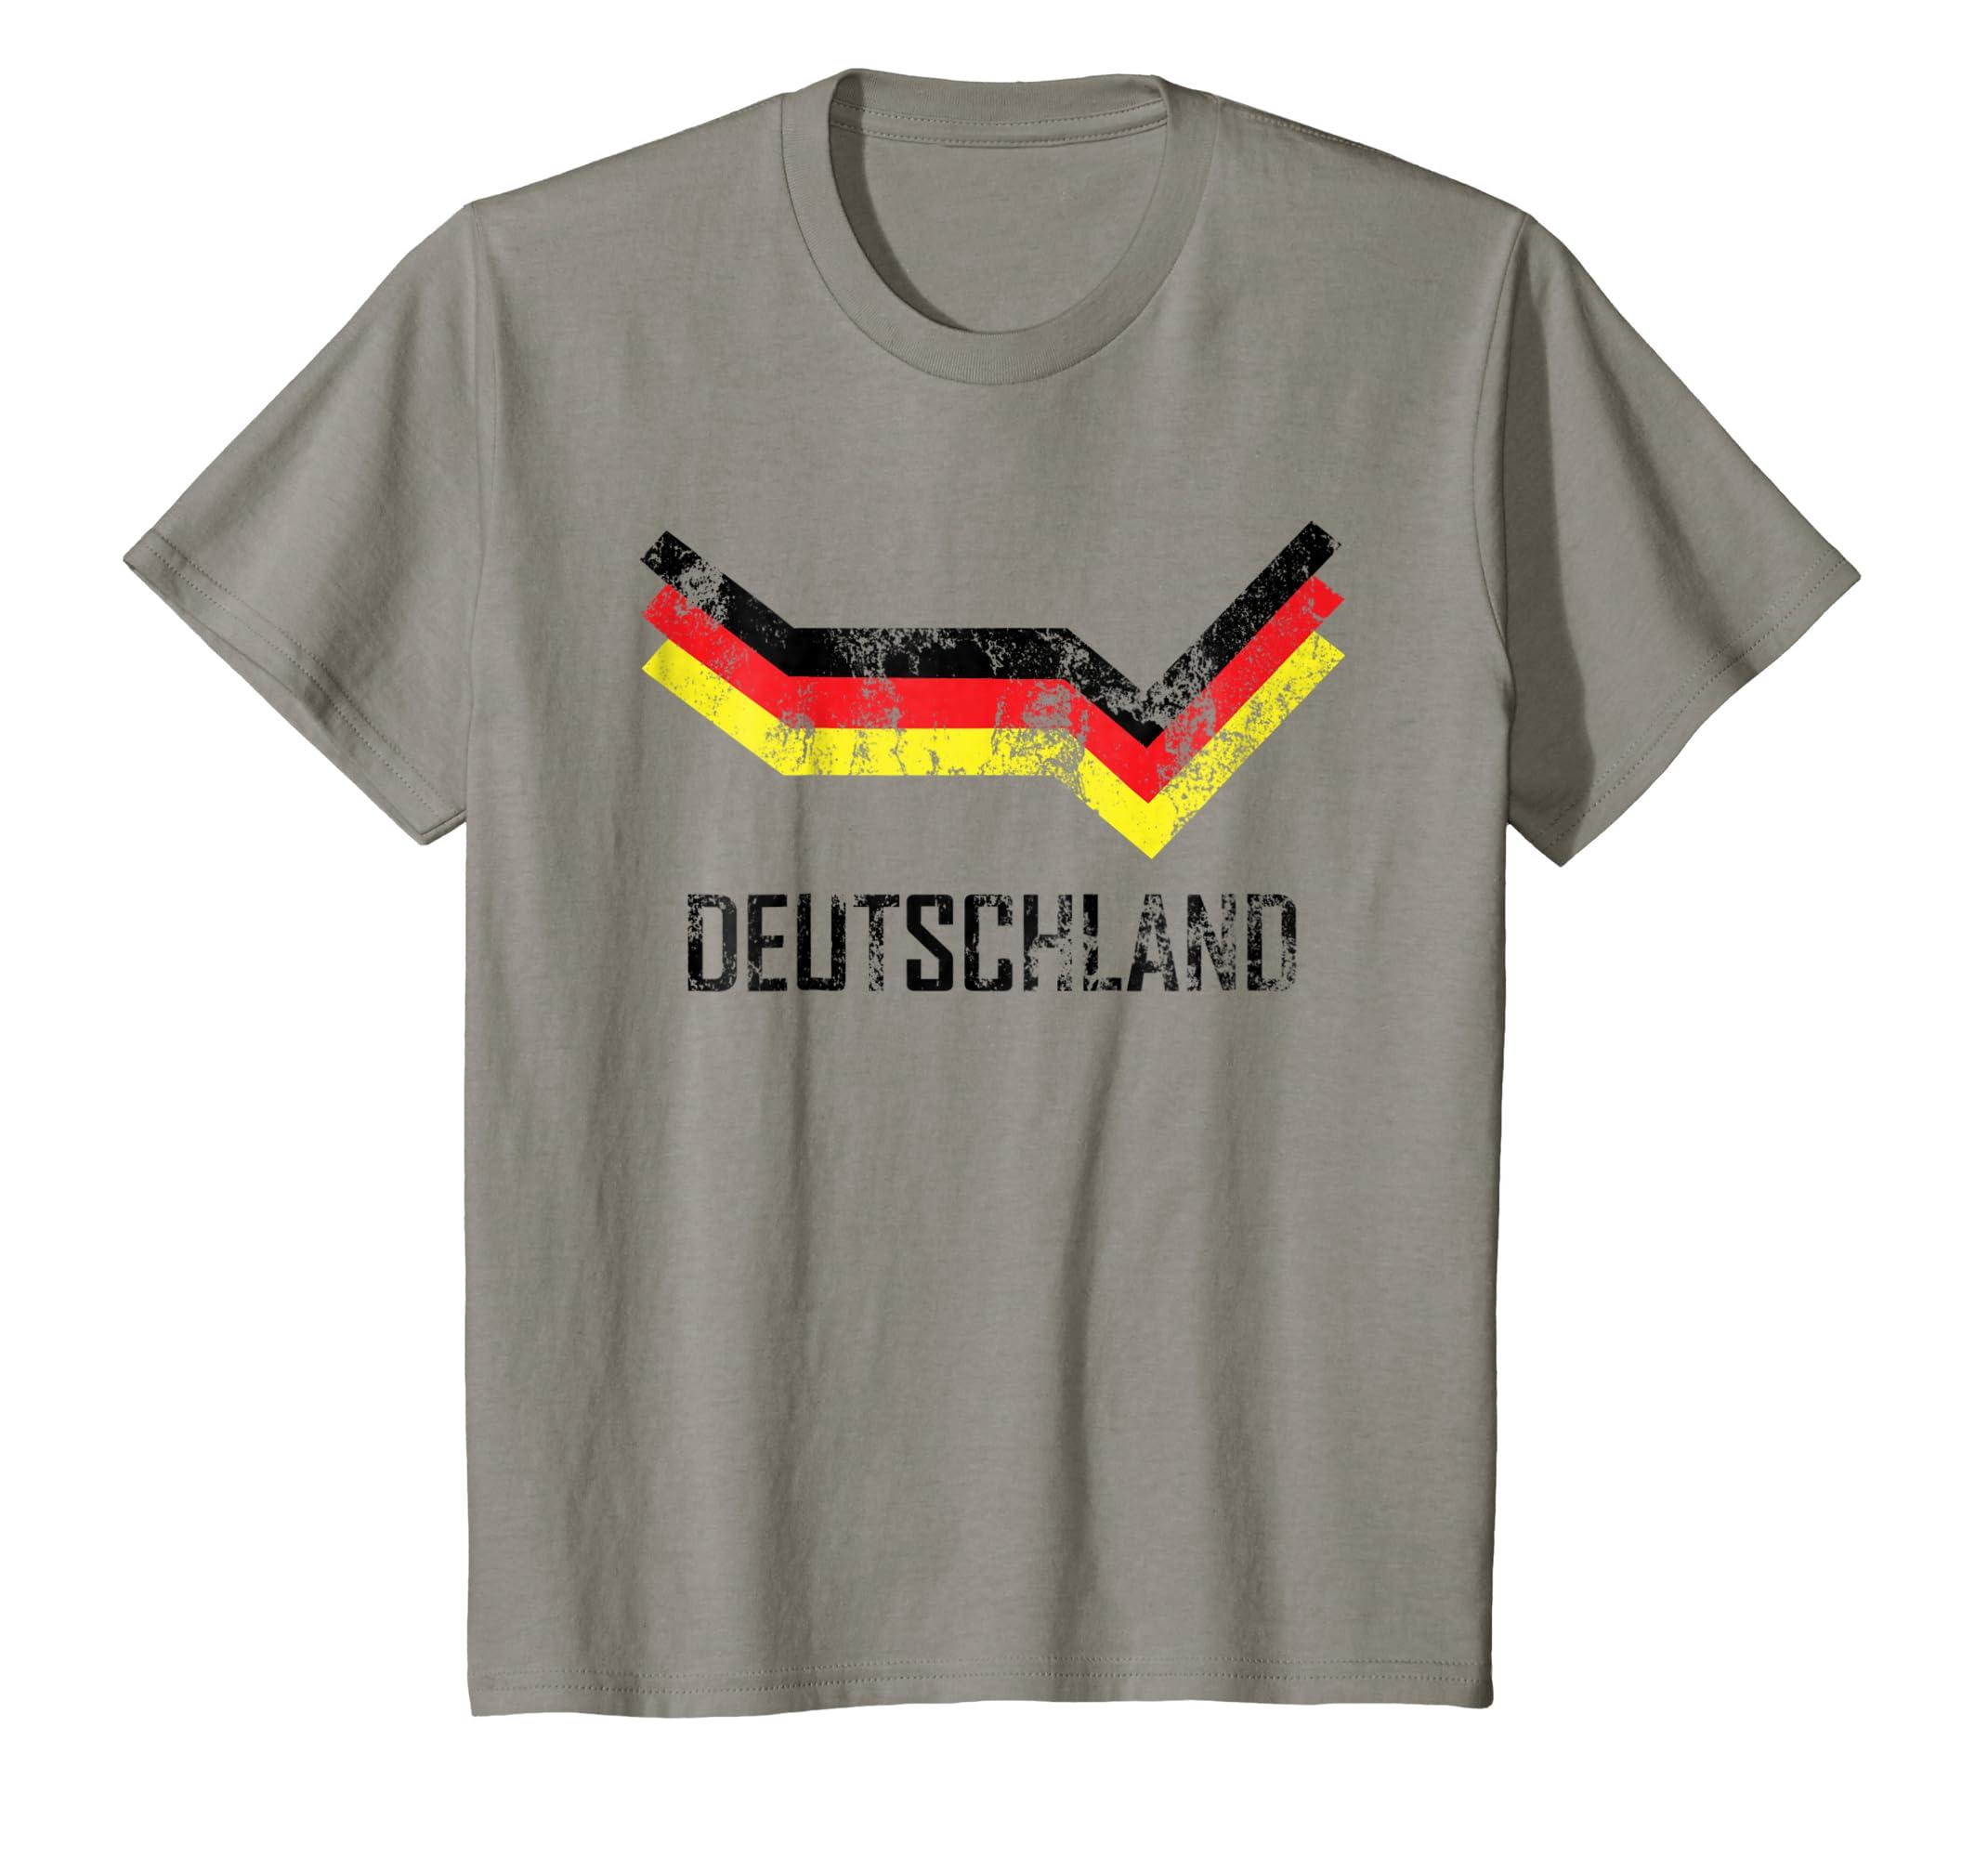 e633d0d5429 Germany Soccer Jersey T Shirt - Nils Stucki Kieferorthopäde